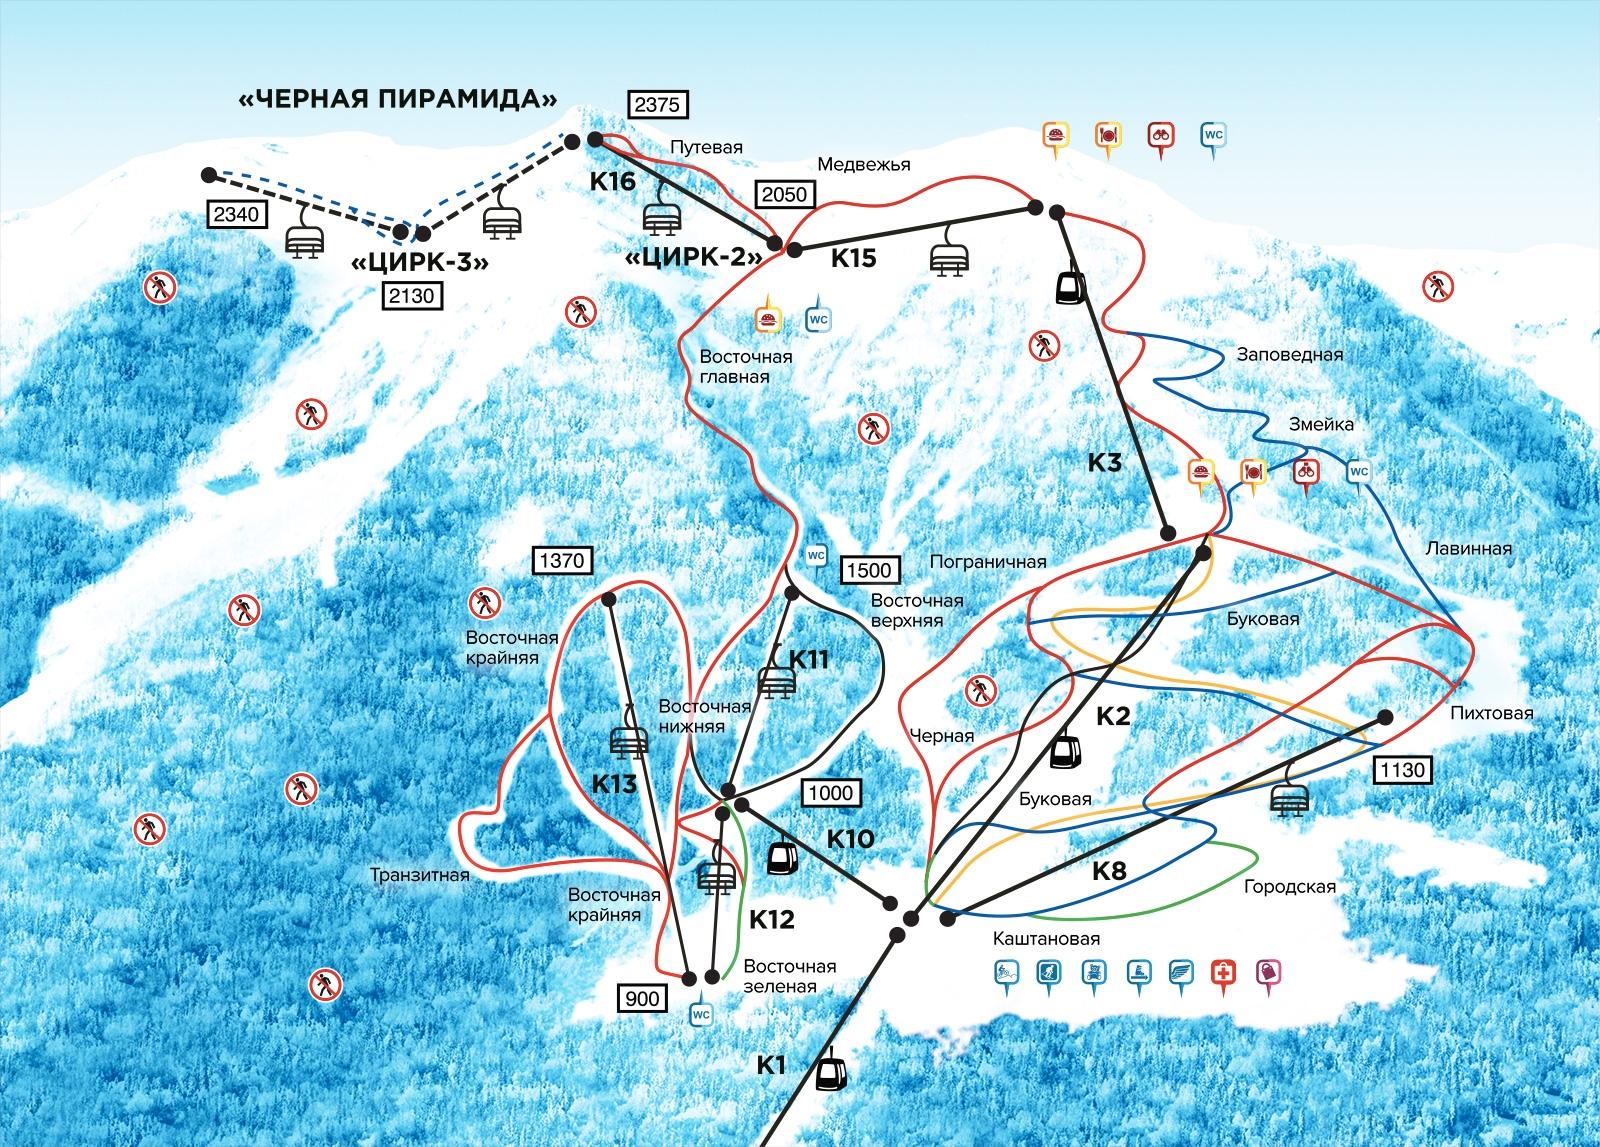 горнолыжный курорт сочи схема картинка